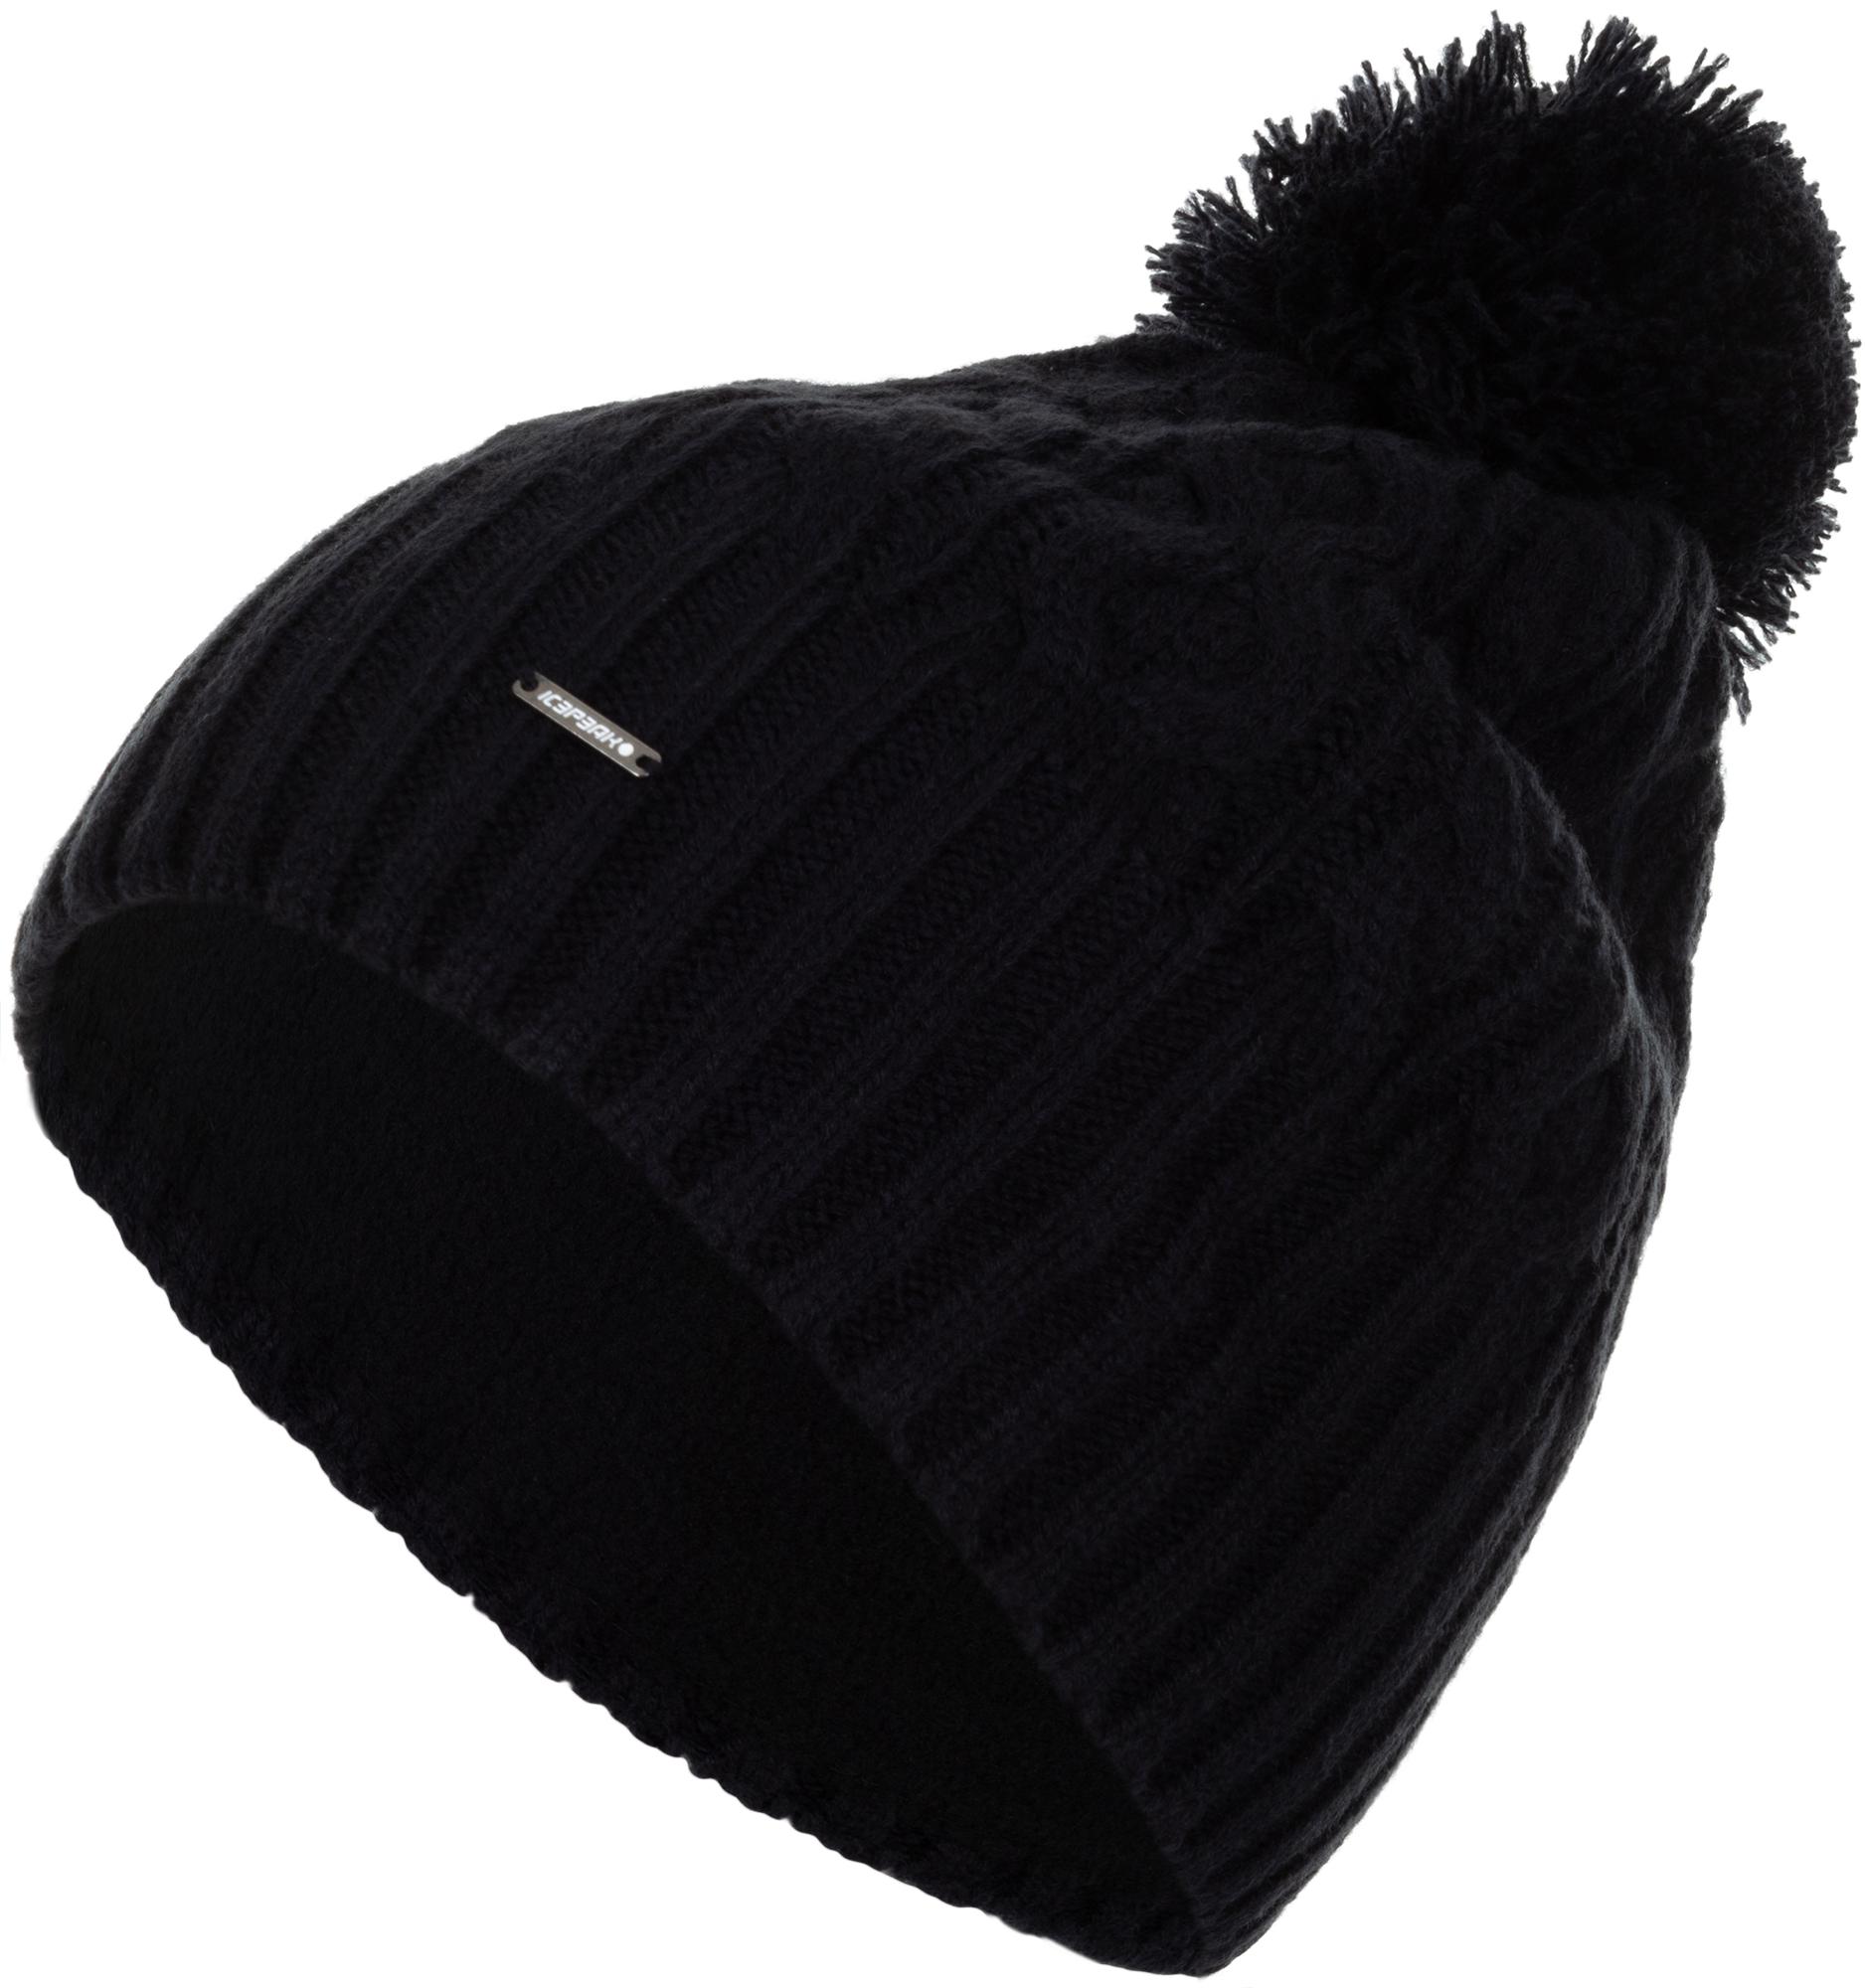 IcePeak Шапка женская IcePeak Idetta, размер Без размера icepeak шапка мужская icepeak iolo размер без размера